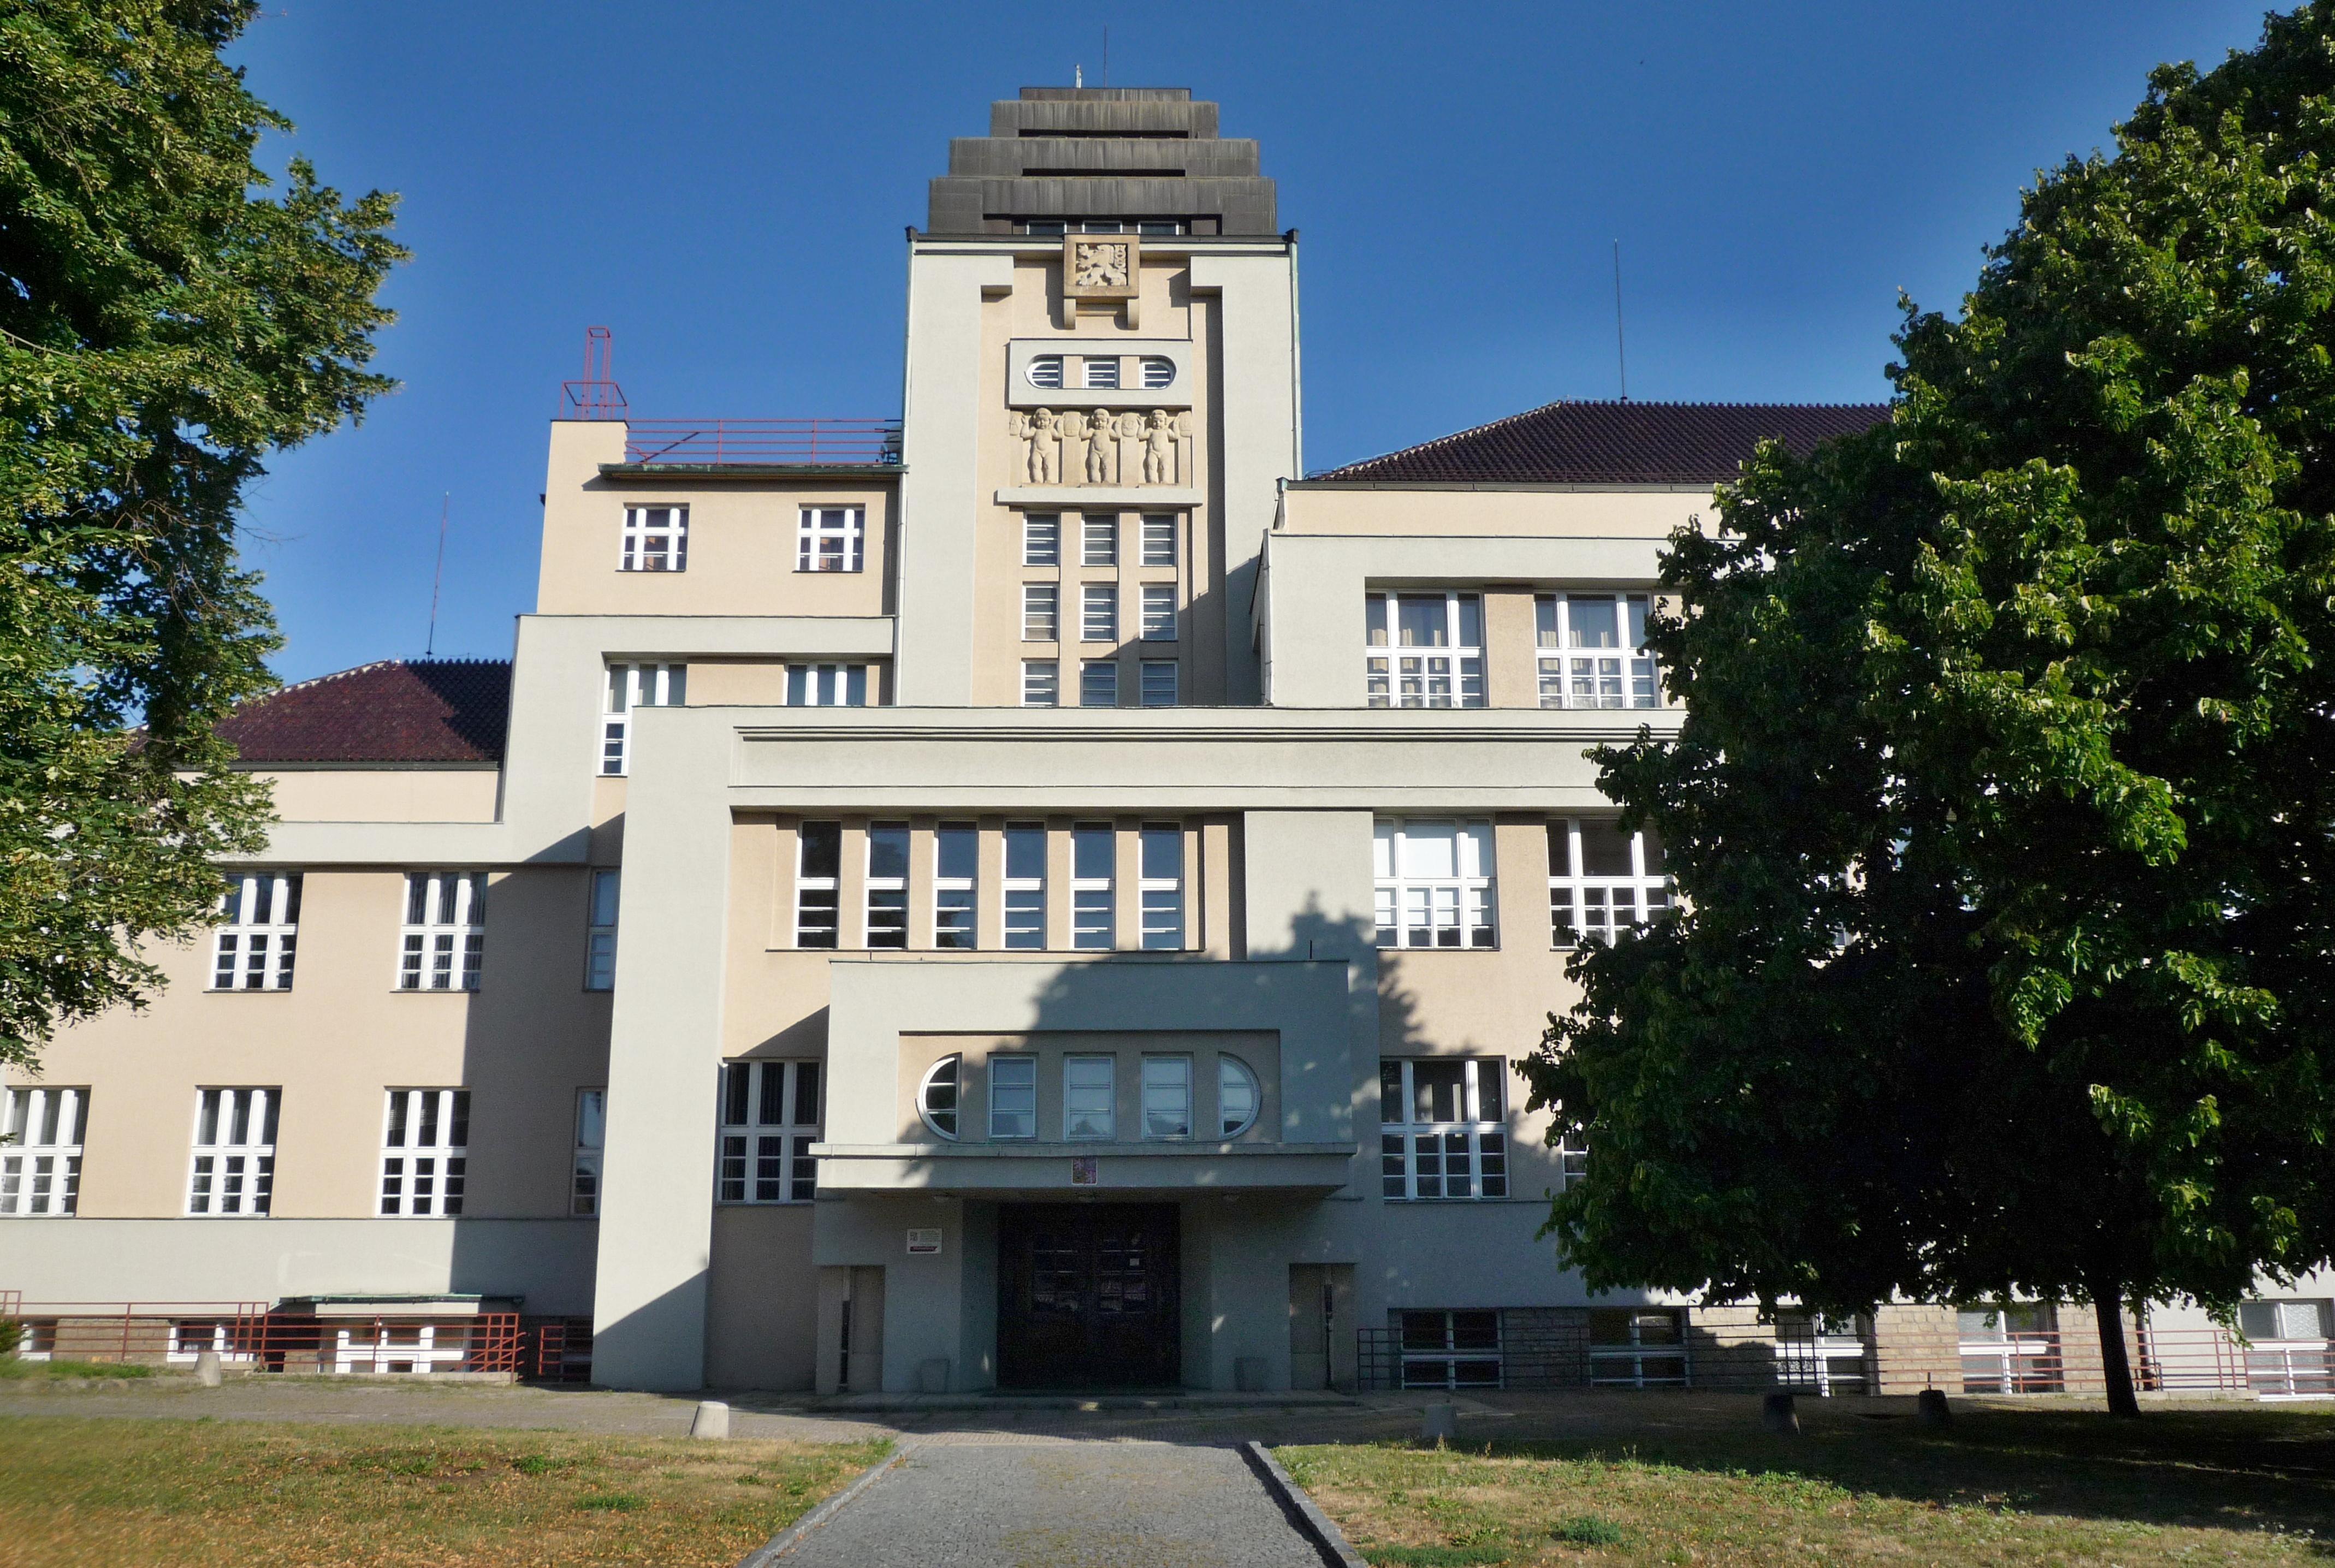 8143-prumyslova-skola-2.jpg